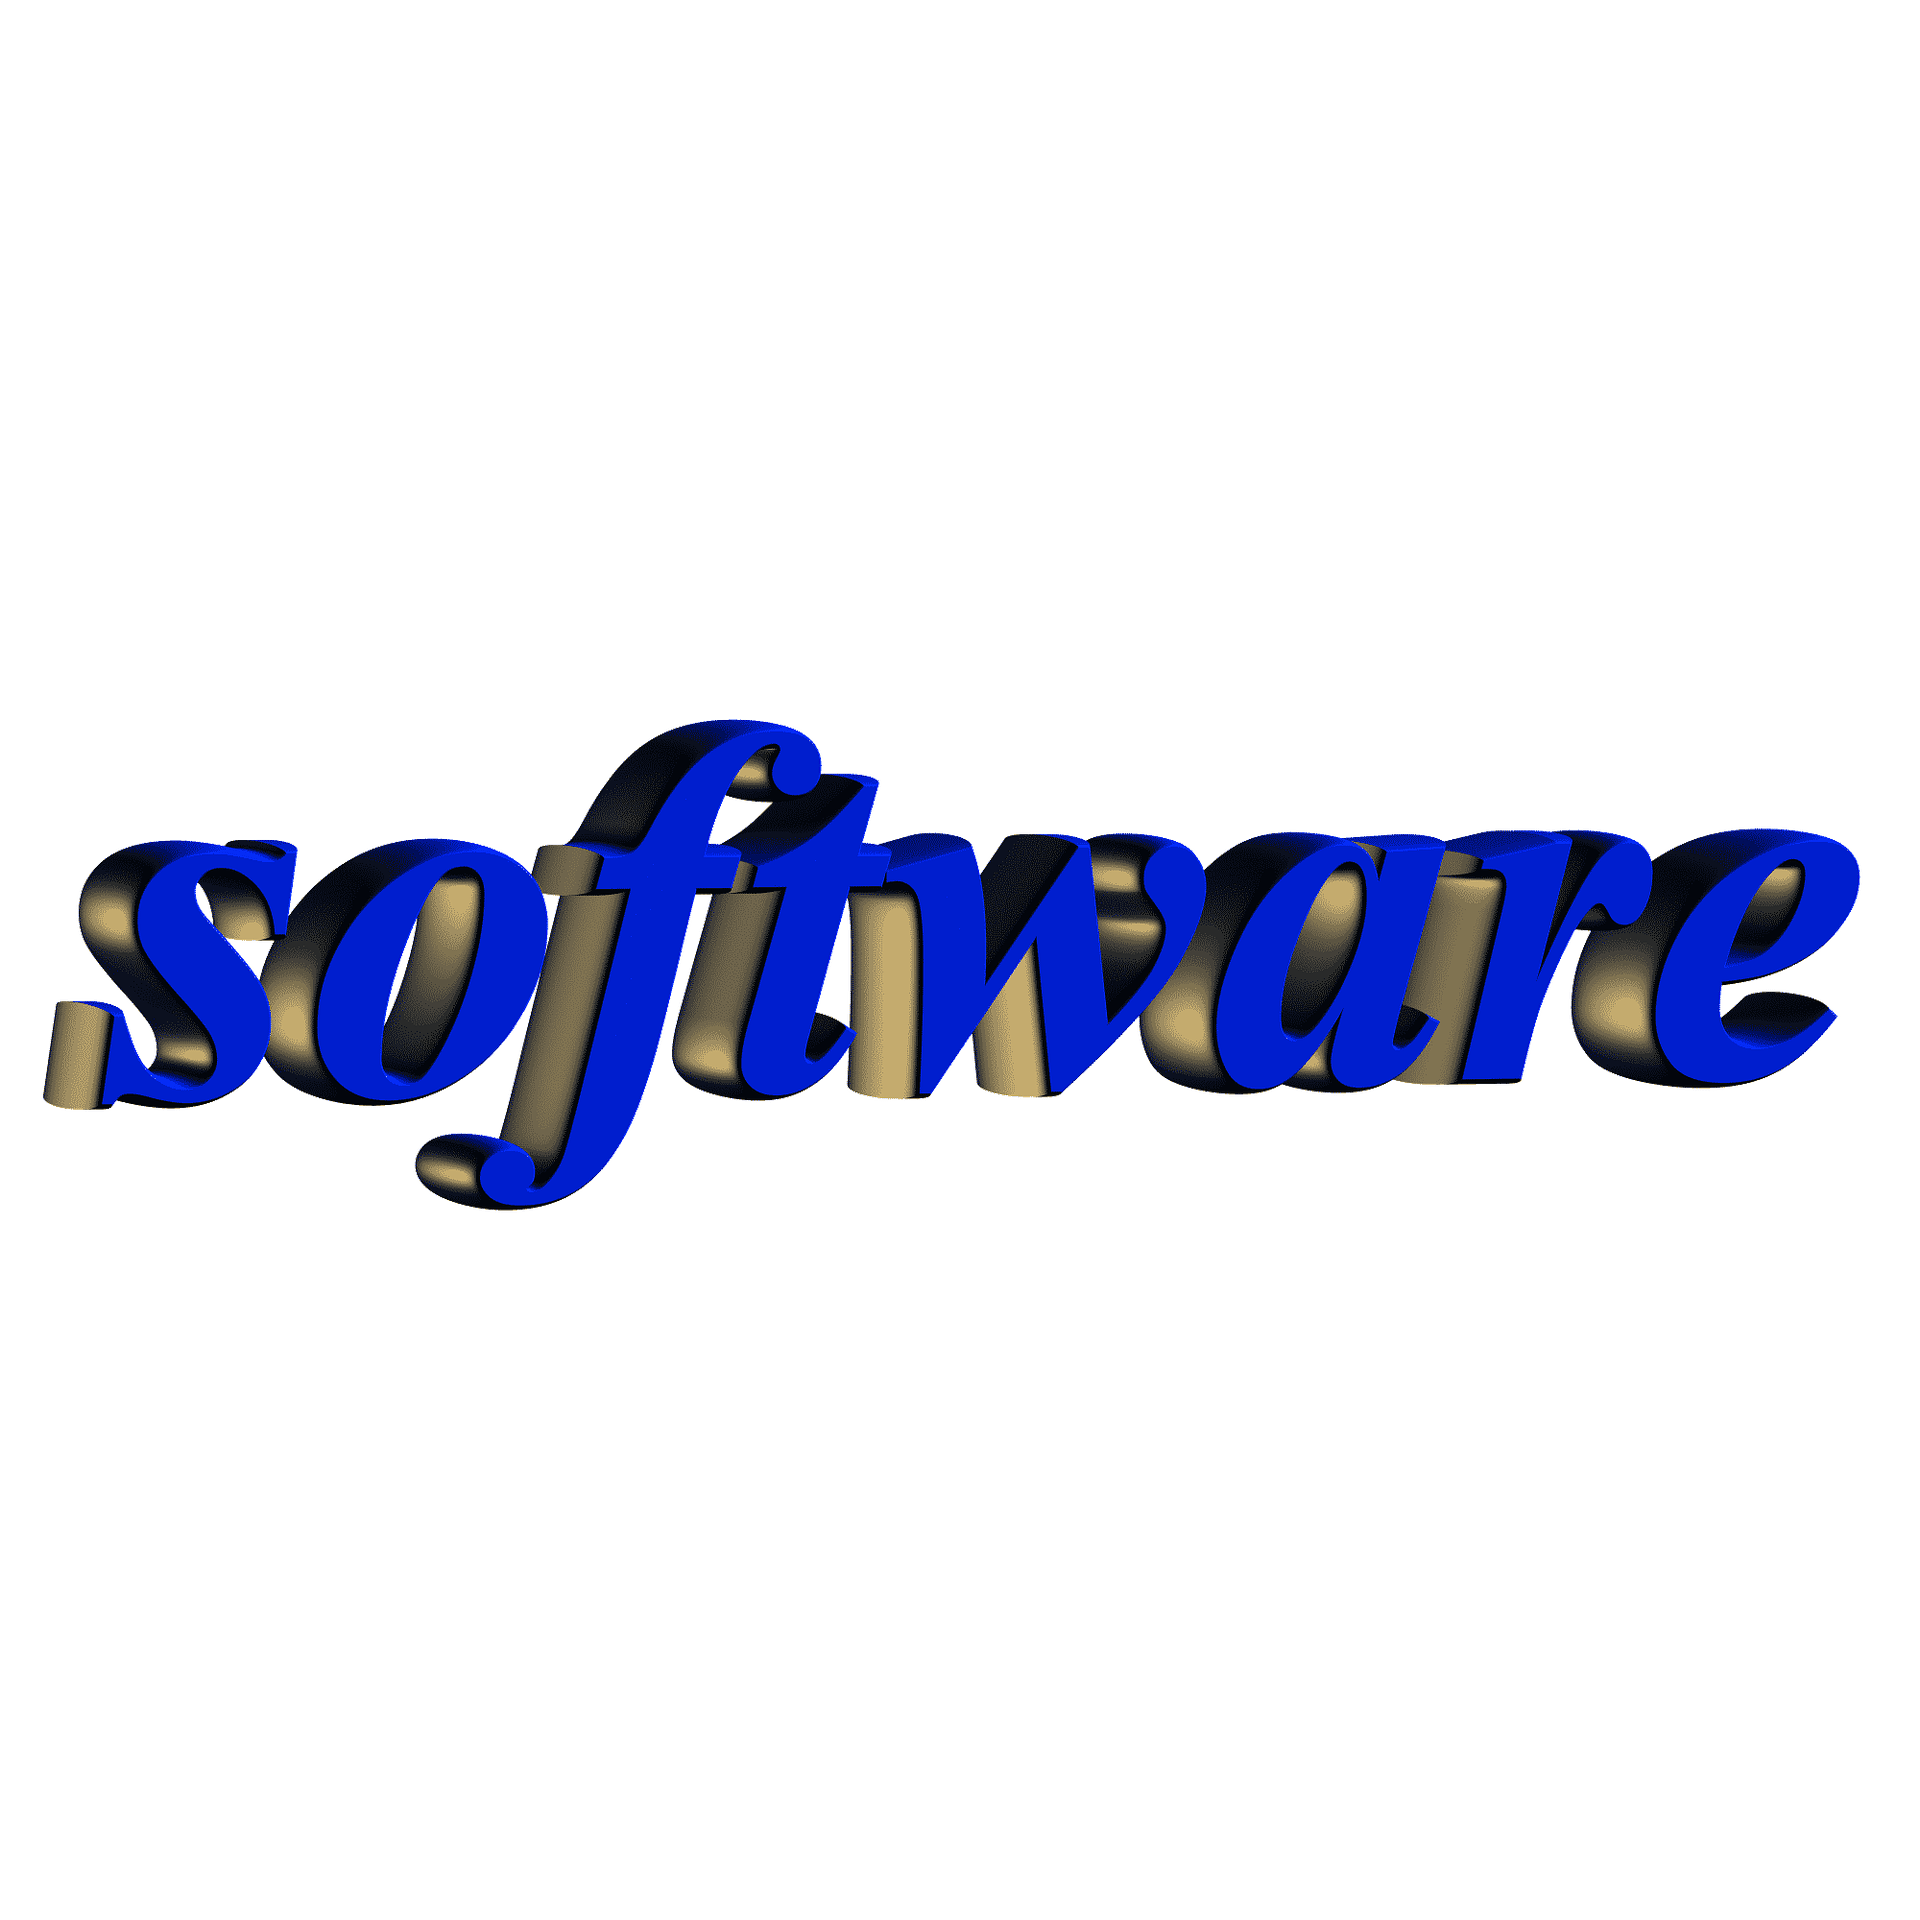 Blog Writing Softwares